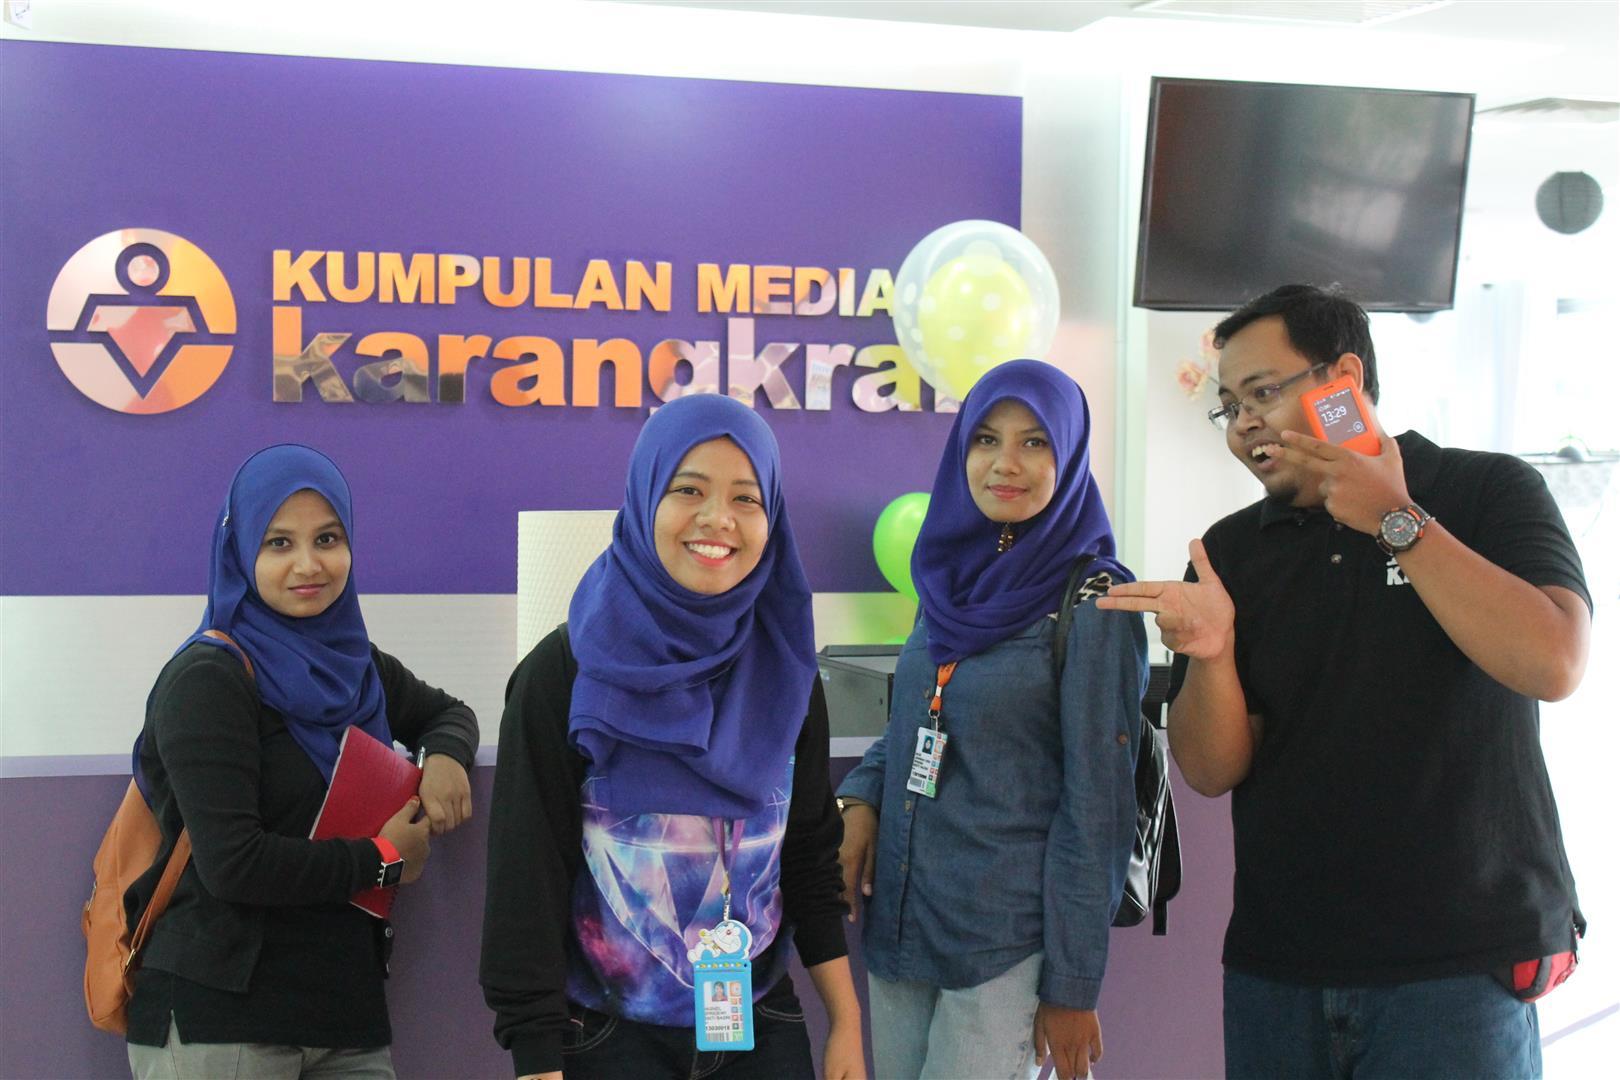 Trip to Kumpulan Media KarangKraf 28